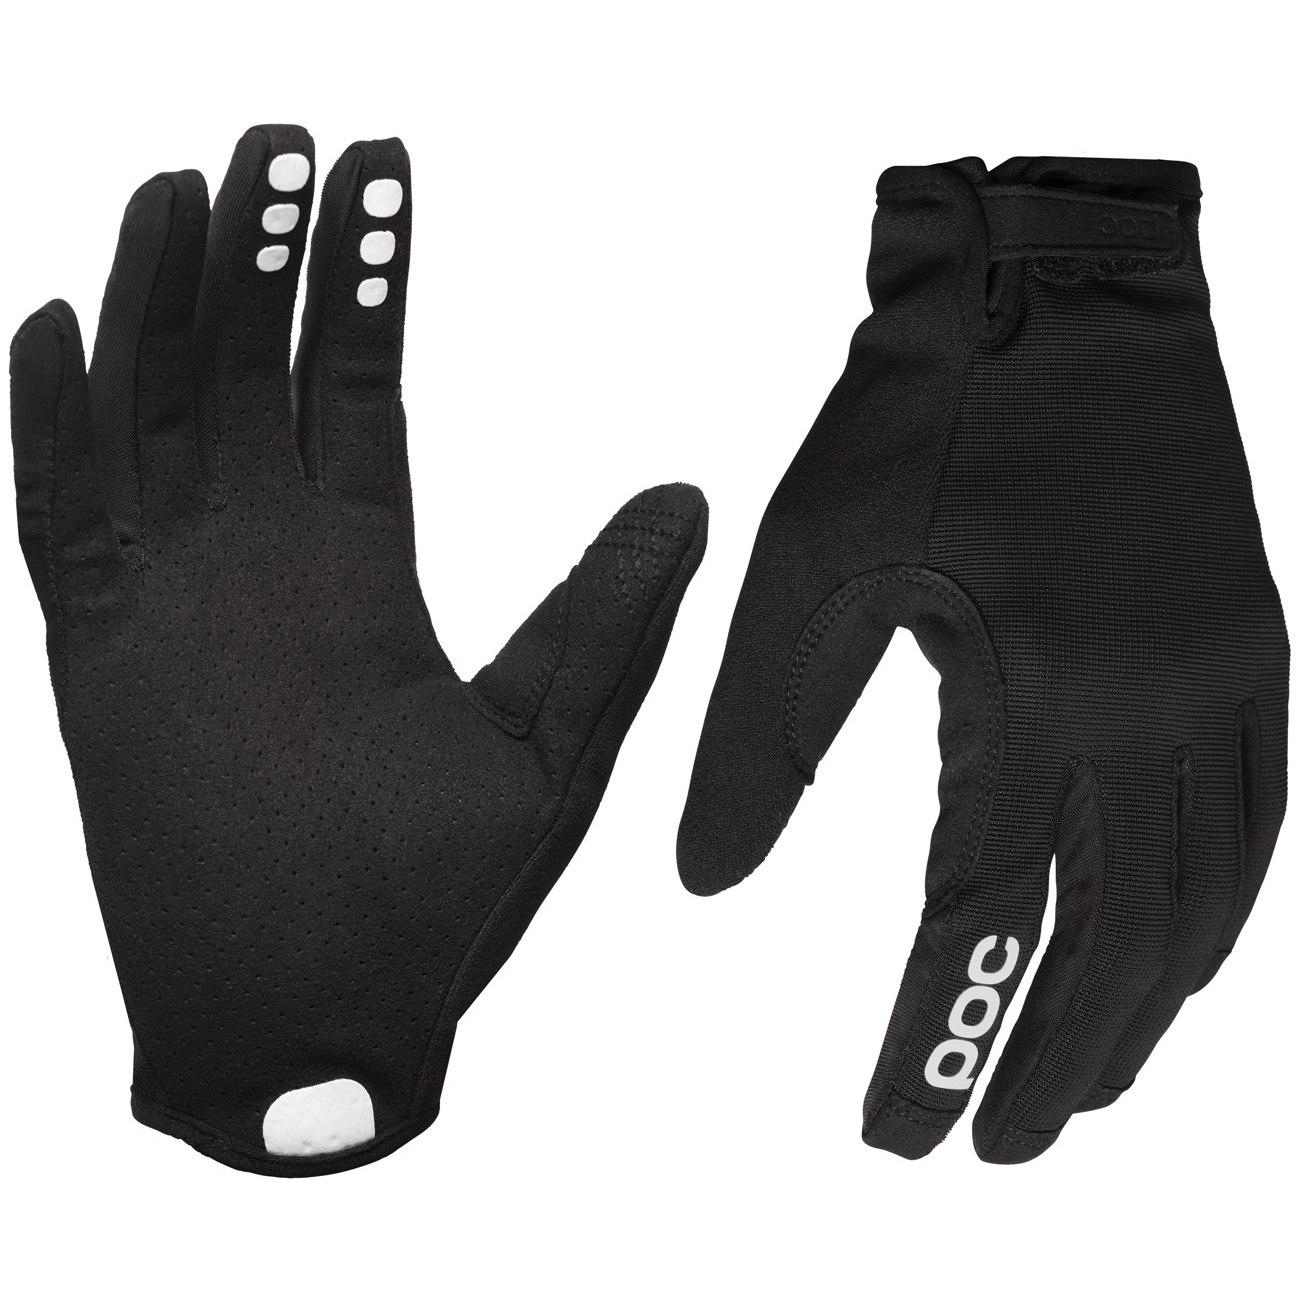 POC Resistance Enduro Adjustable Glove Handschuh - 8204 Uranium black/Uranium Black